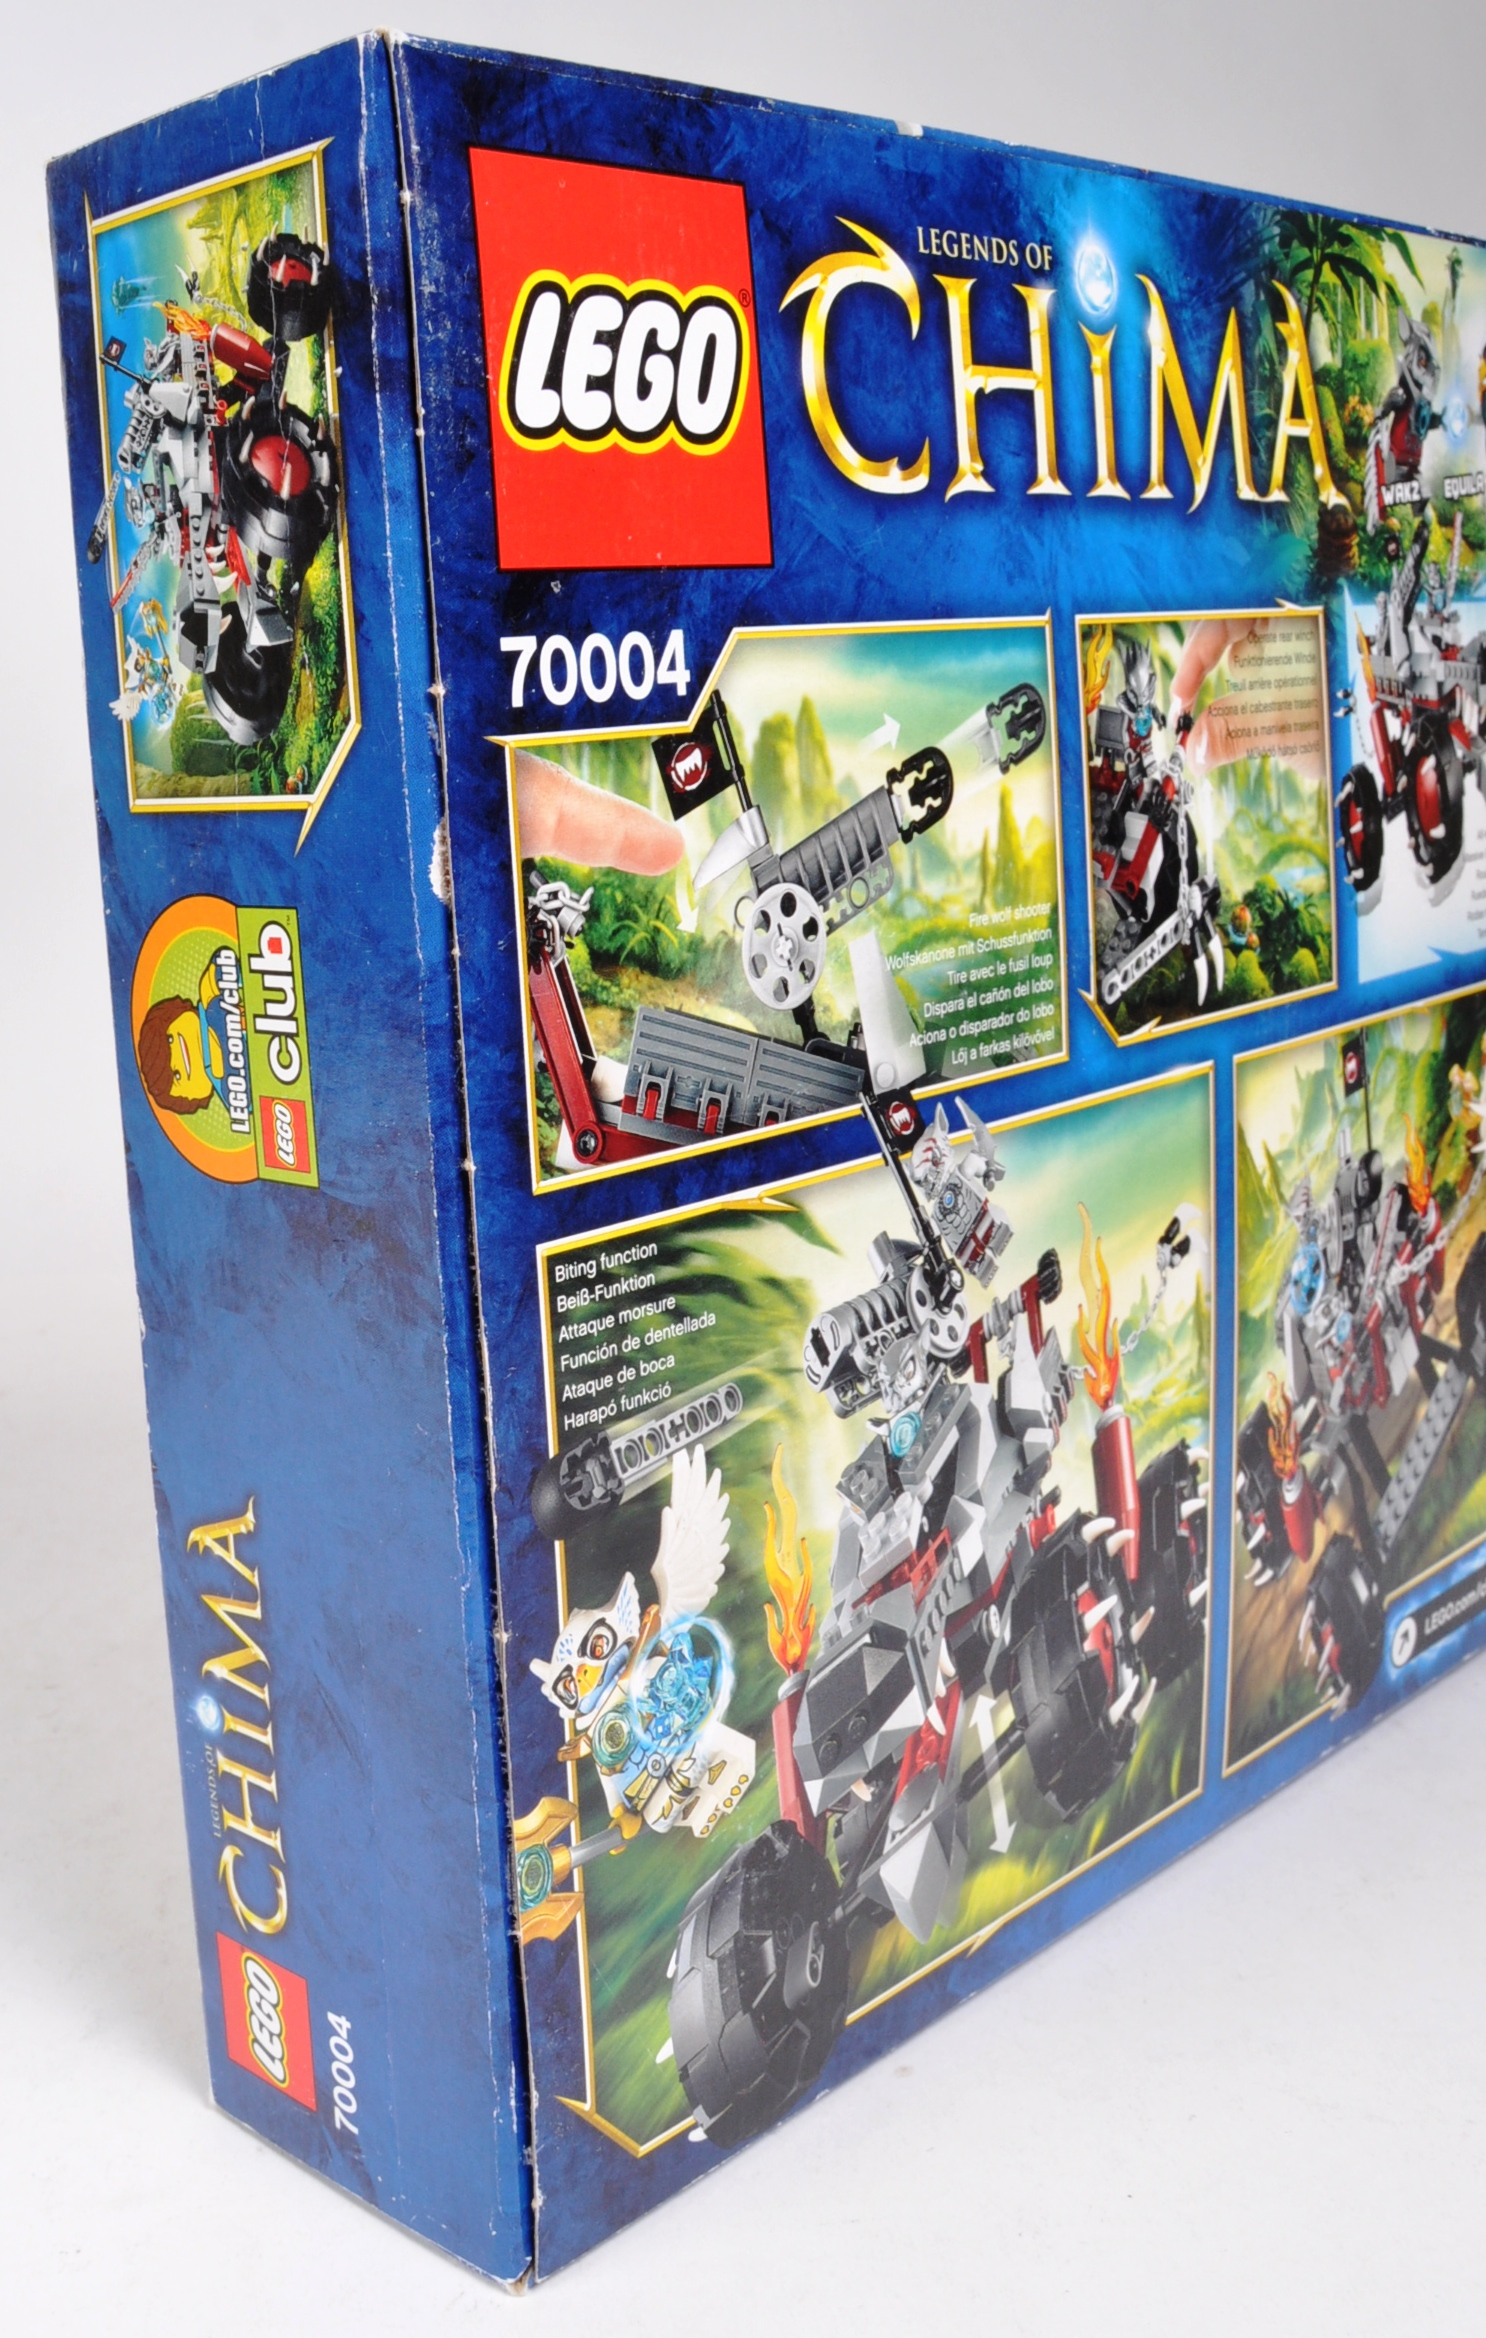 LEGO SETS - LEGENDS OF CHIMA - 70004 / 70132 - Image 4 of 6